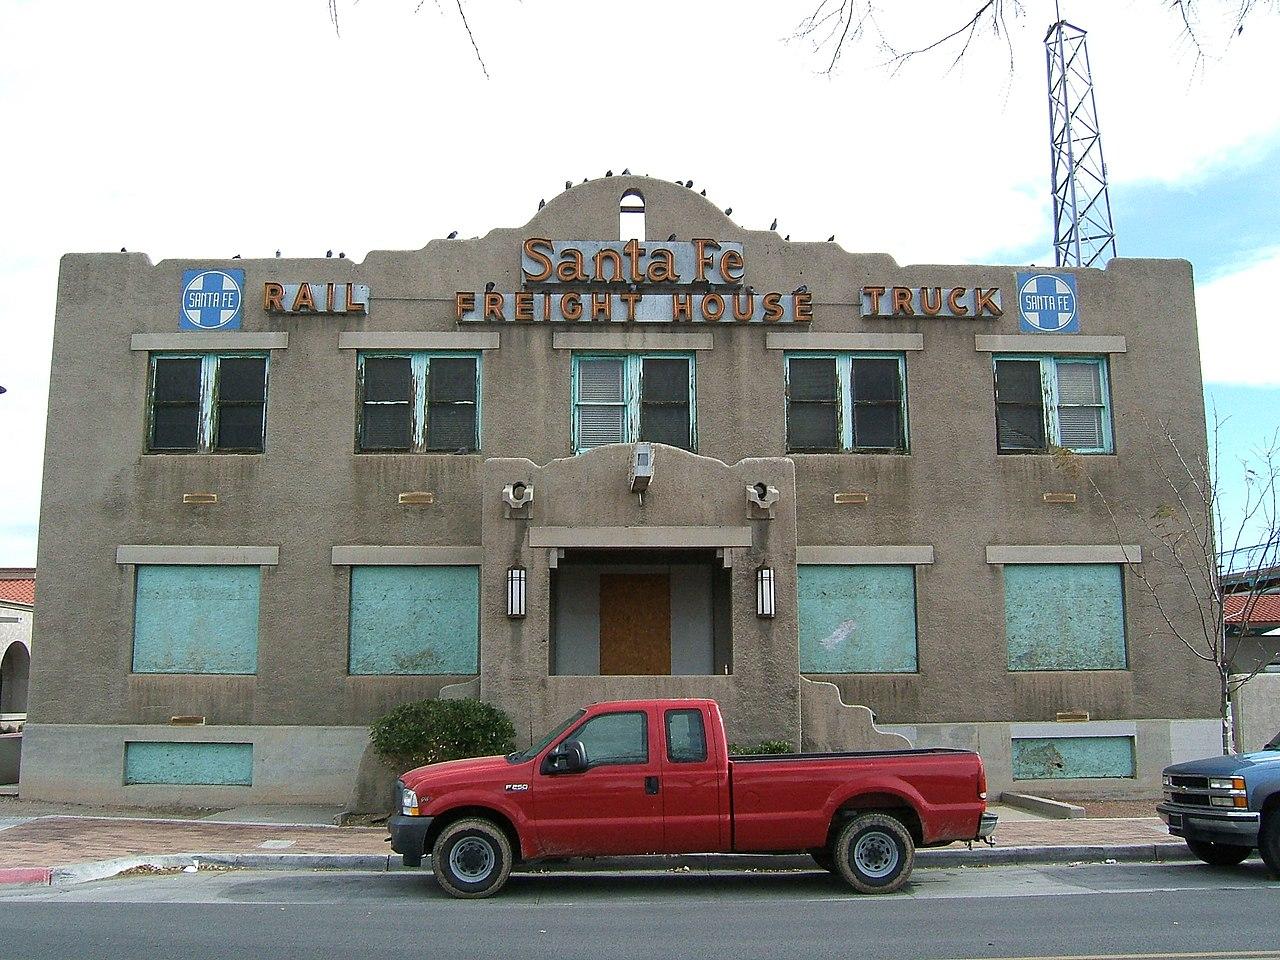 Albuquerque To Santa Fe >> File:Santa Fe Freight House, Albuquerque.jpg - Wikimedia Commons